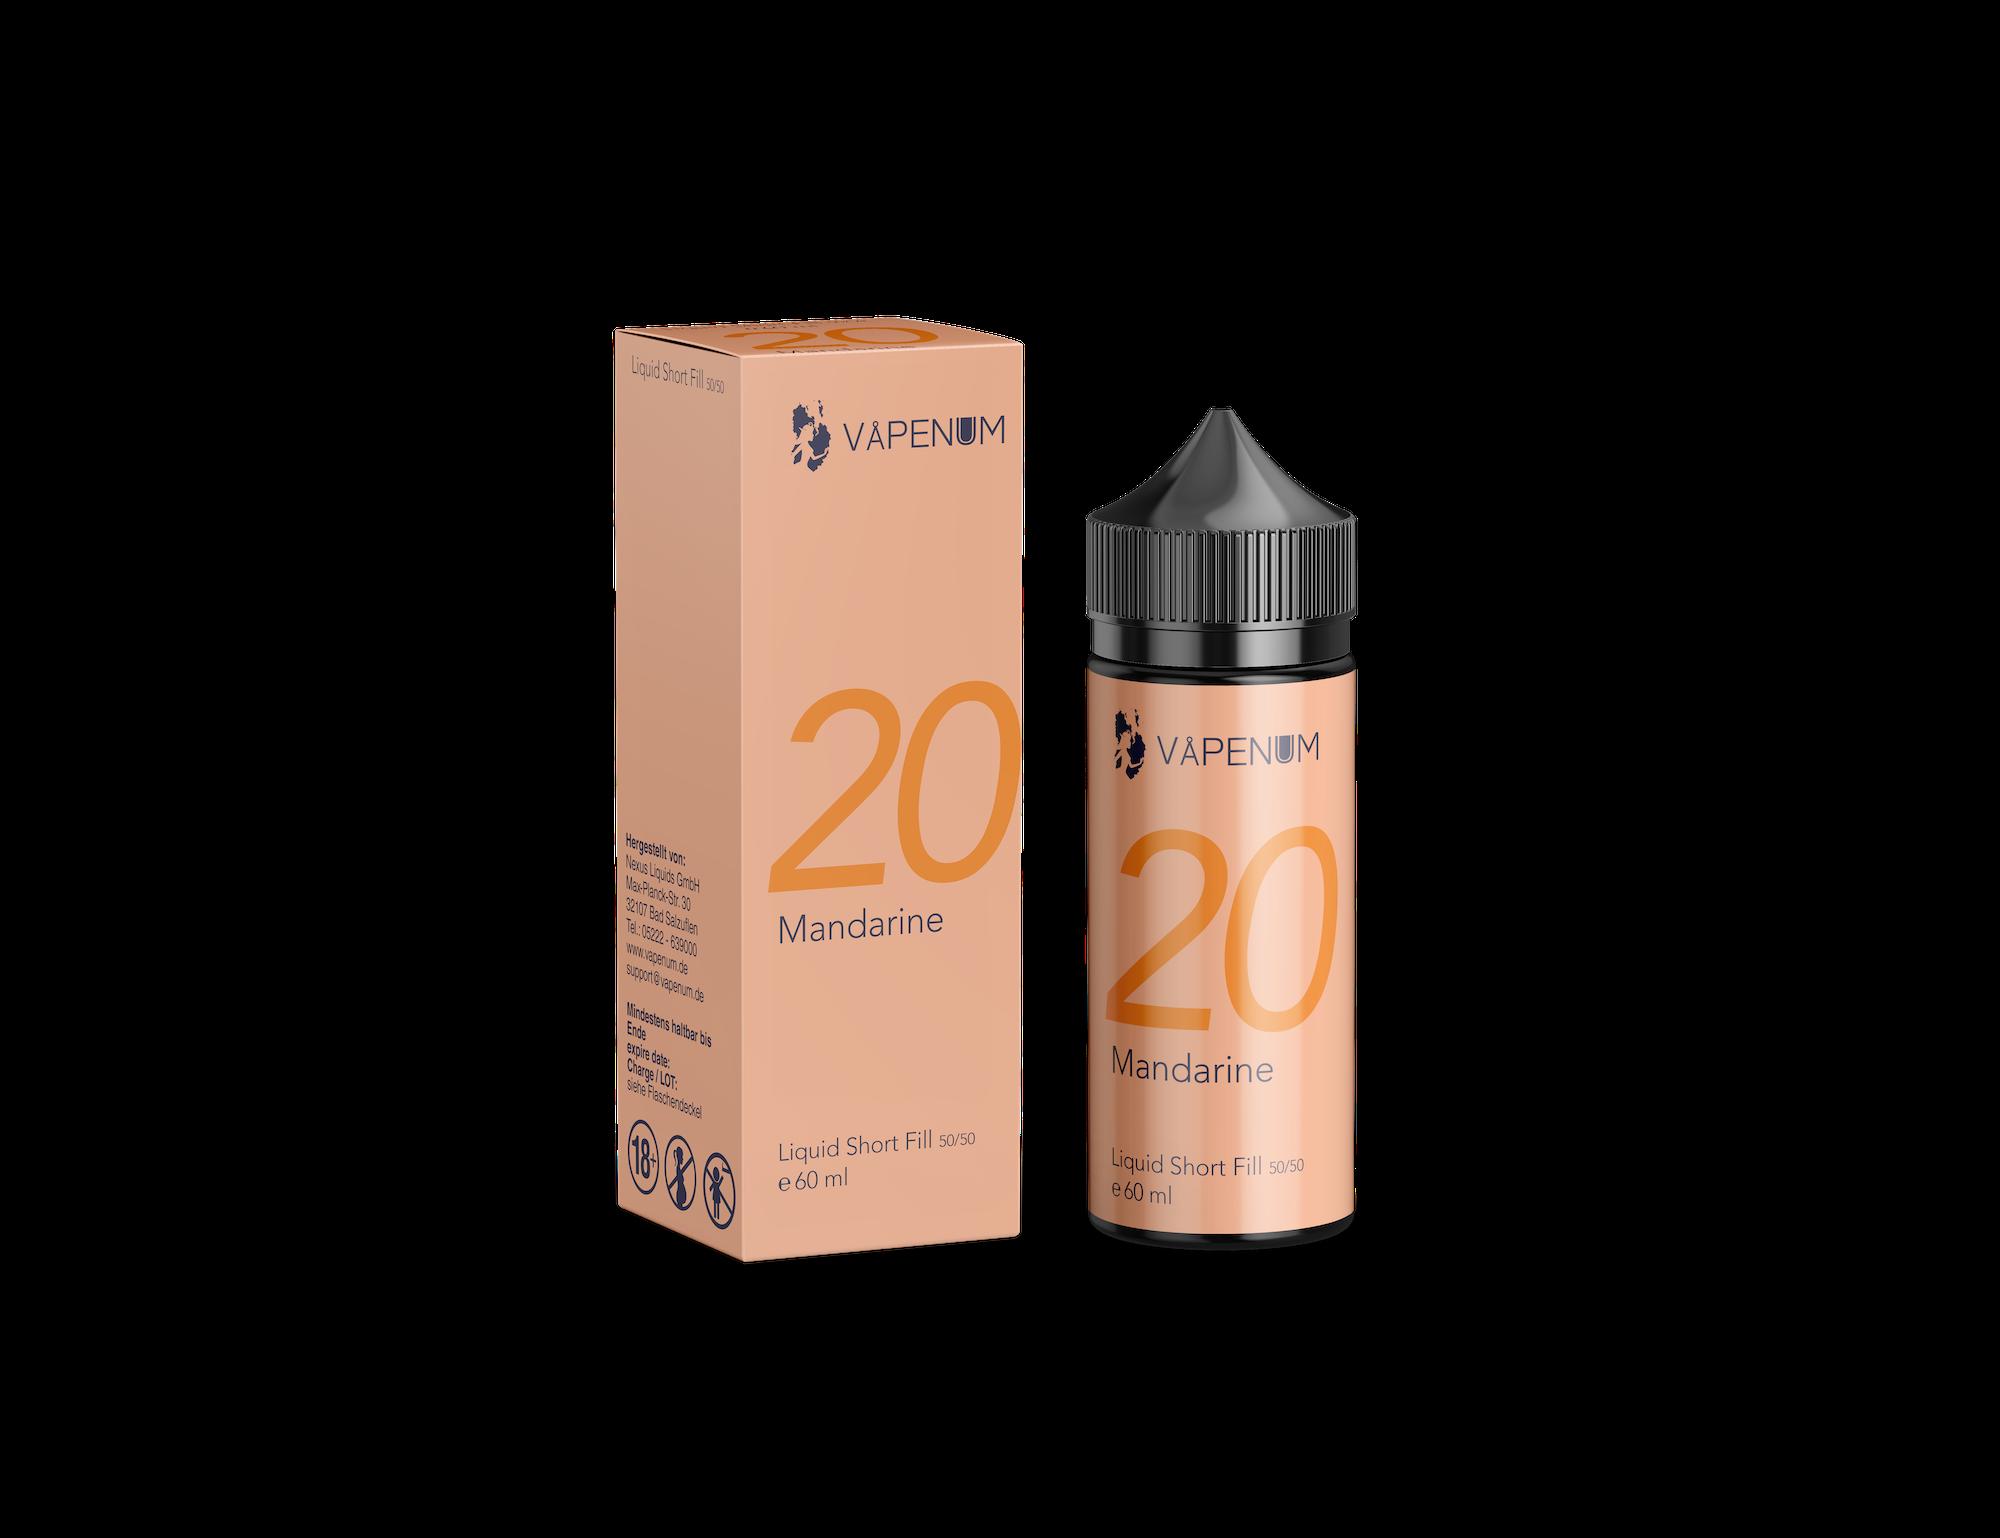 Vapenum Shortfill 20 - Mandarine